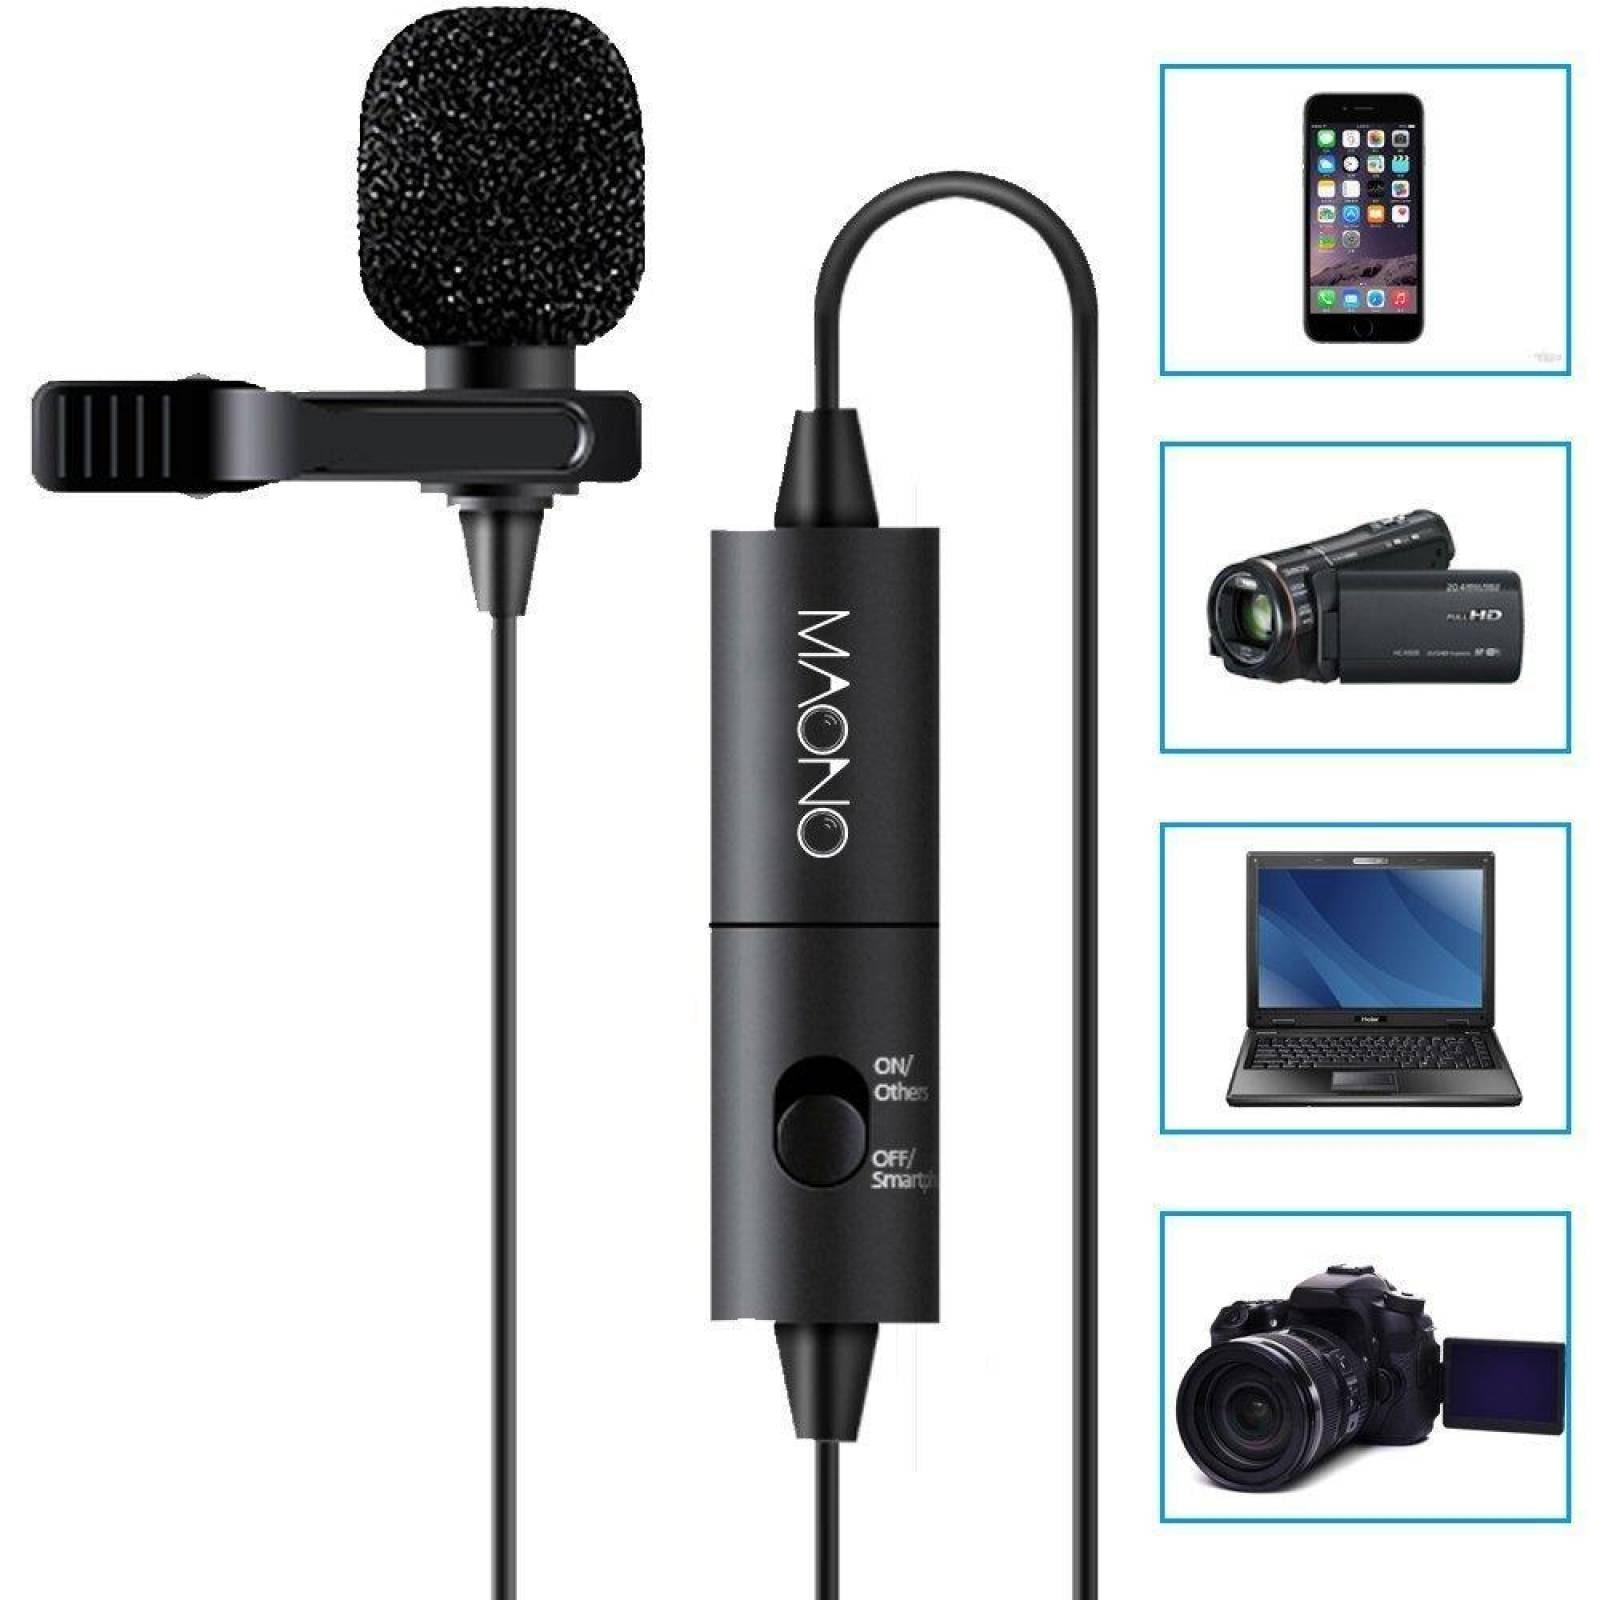 Micrófono AU100 Lavalier 7 Basic Maono Ultra Ligero Negro